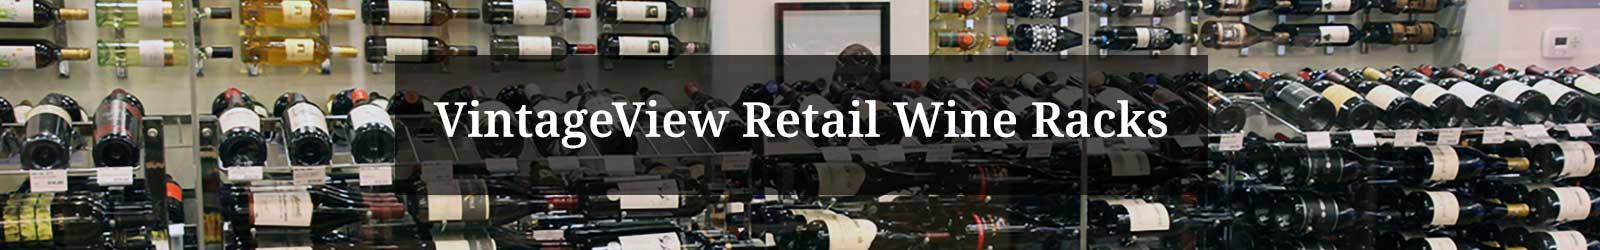 VintageView Retail Wine Racks